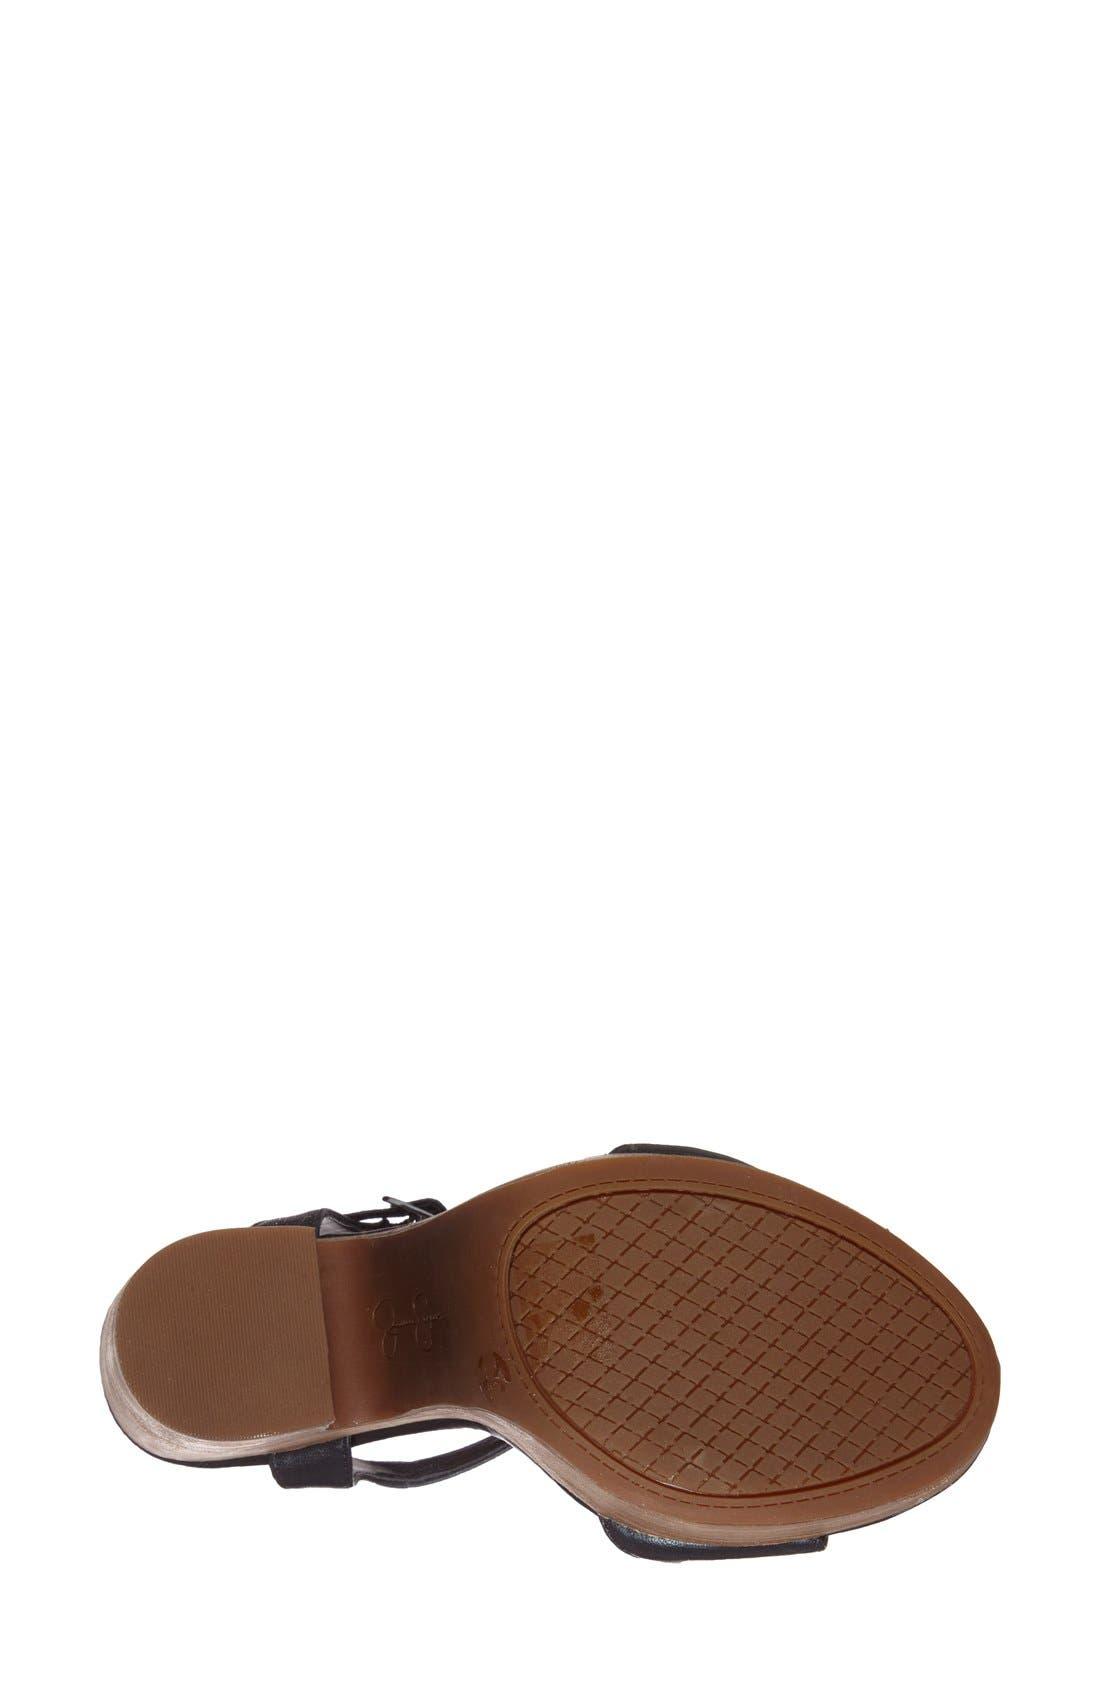 Alternate Image 4  - Jessica Simpson 'Whirl' Platform Sandal (Women)